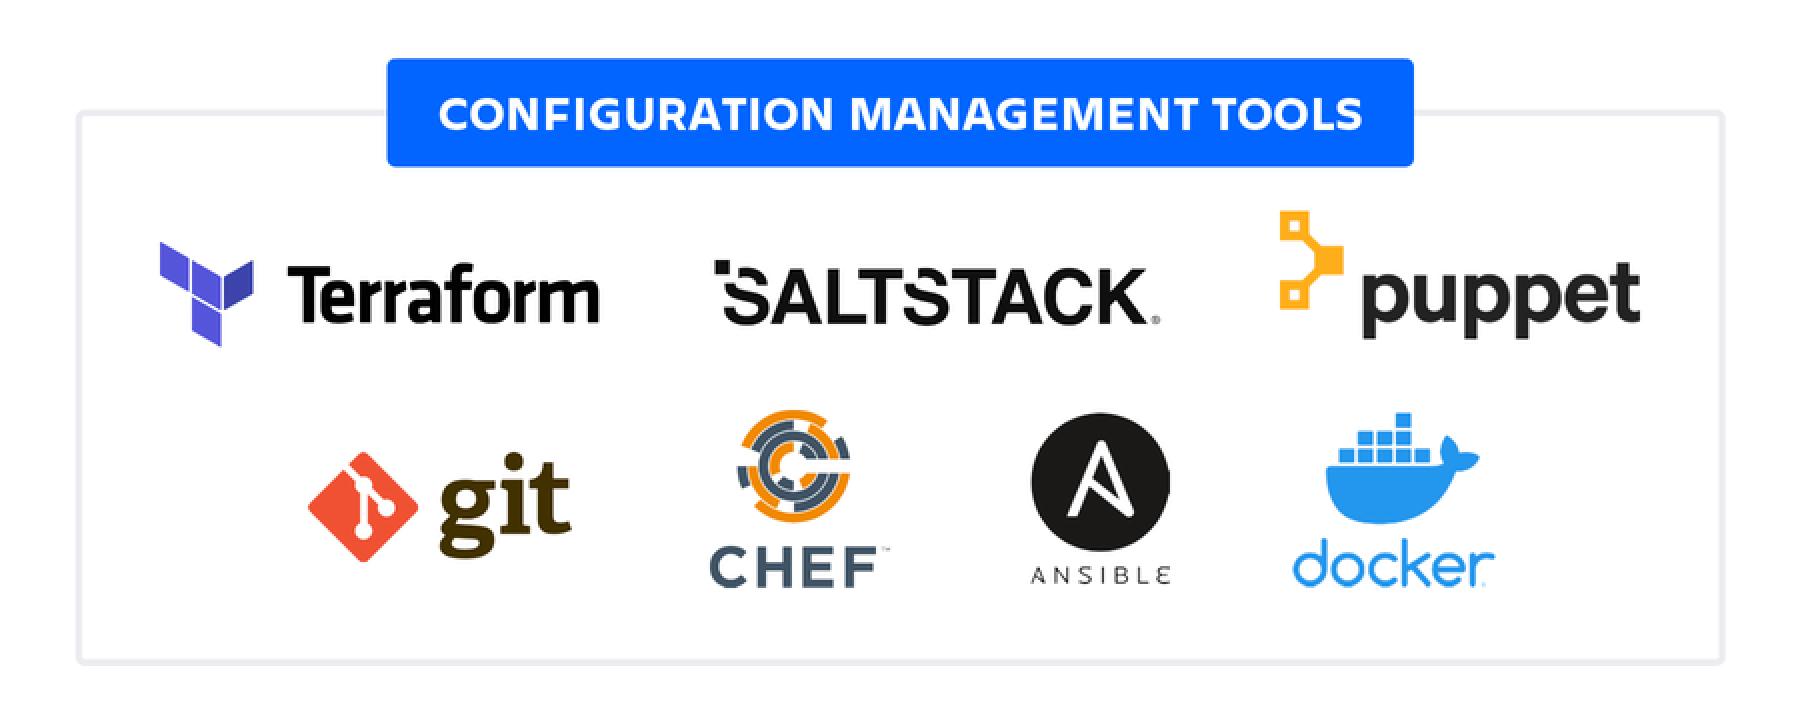 Configuration Management Tools